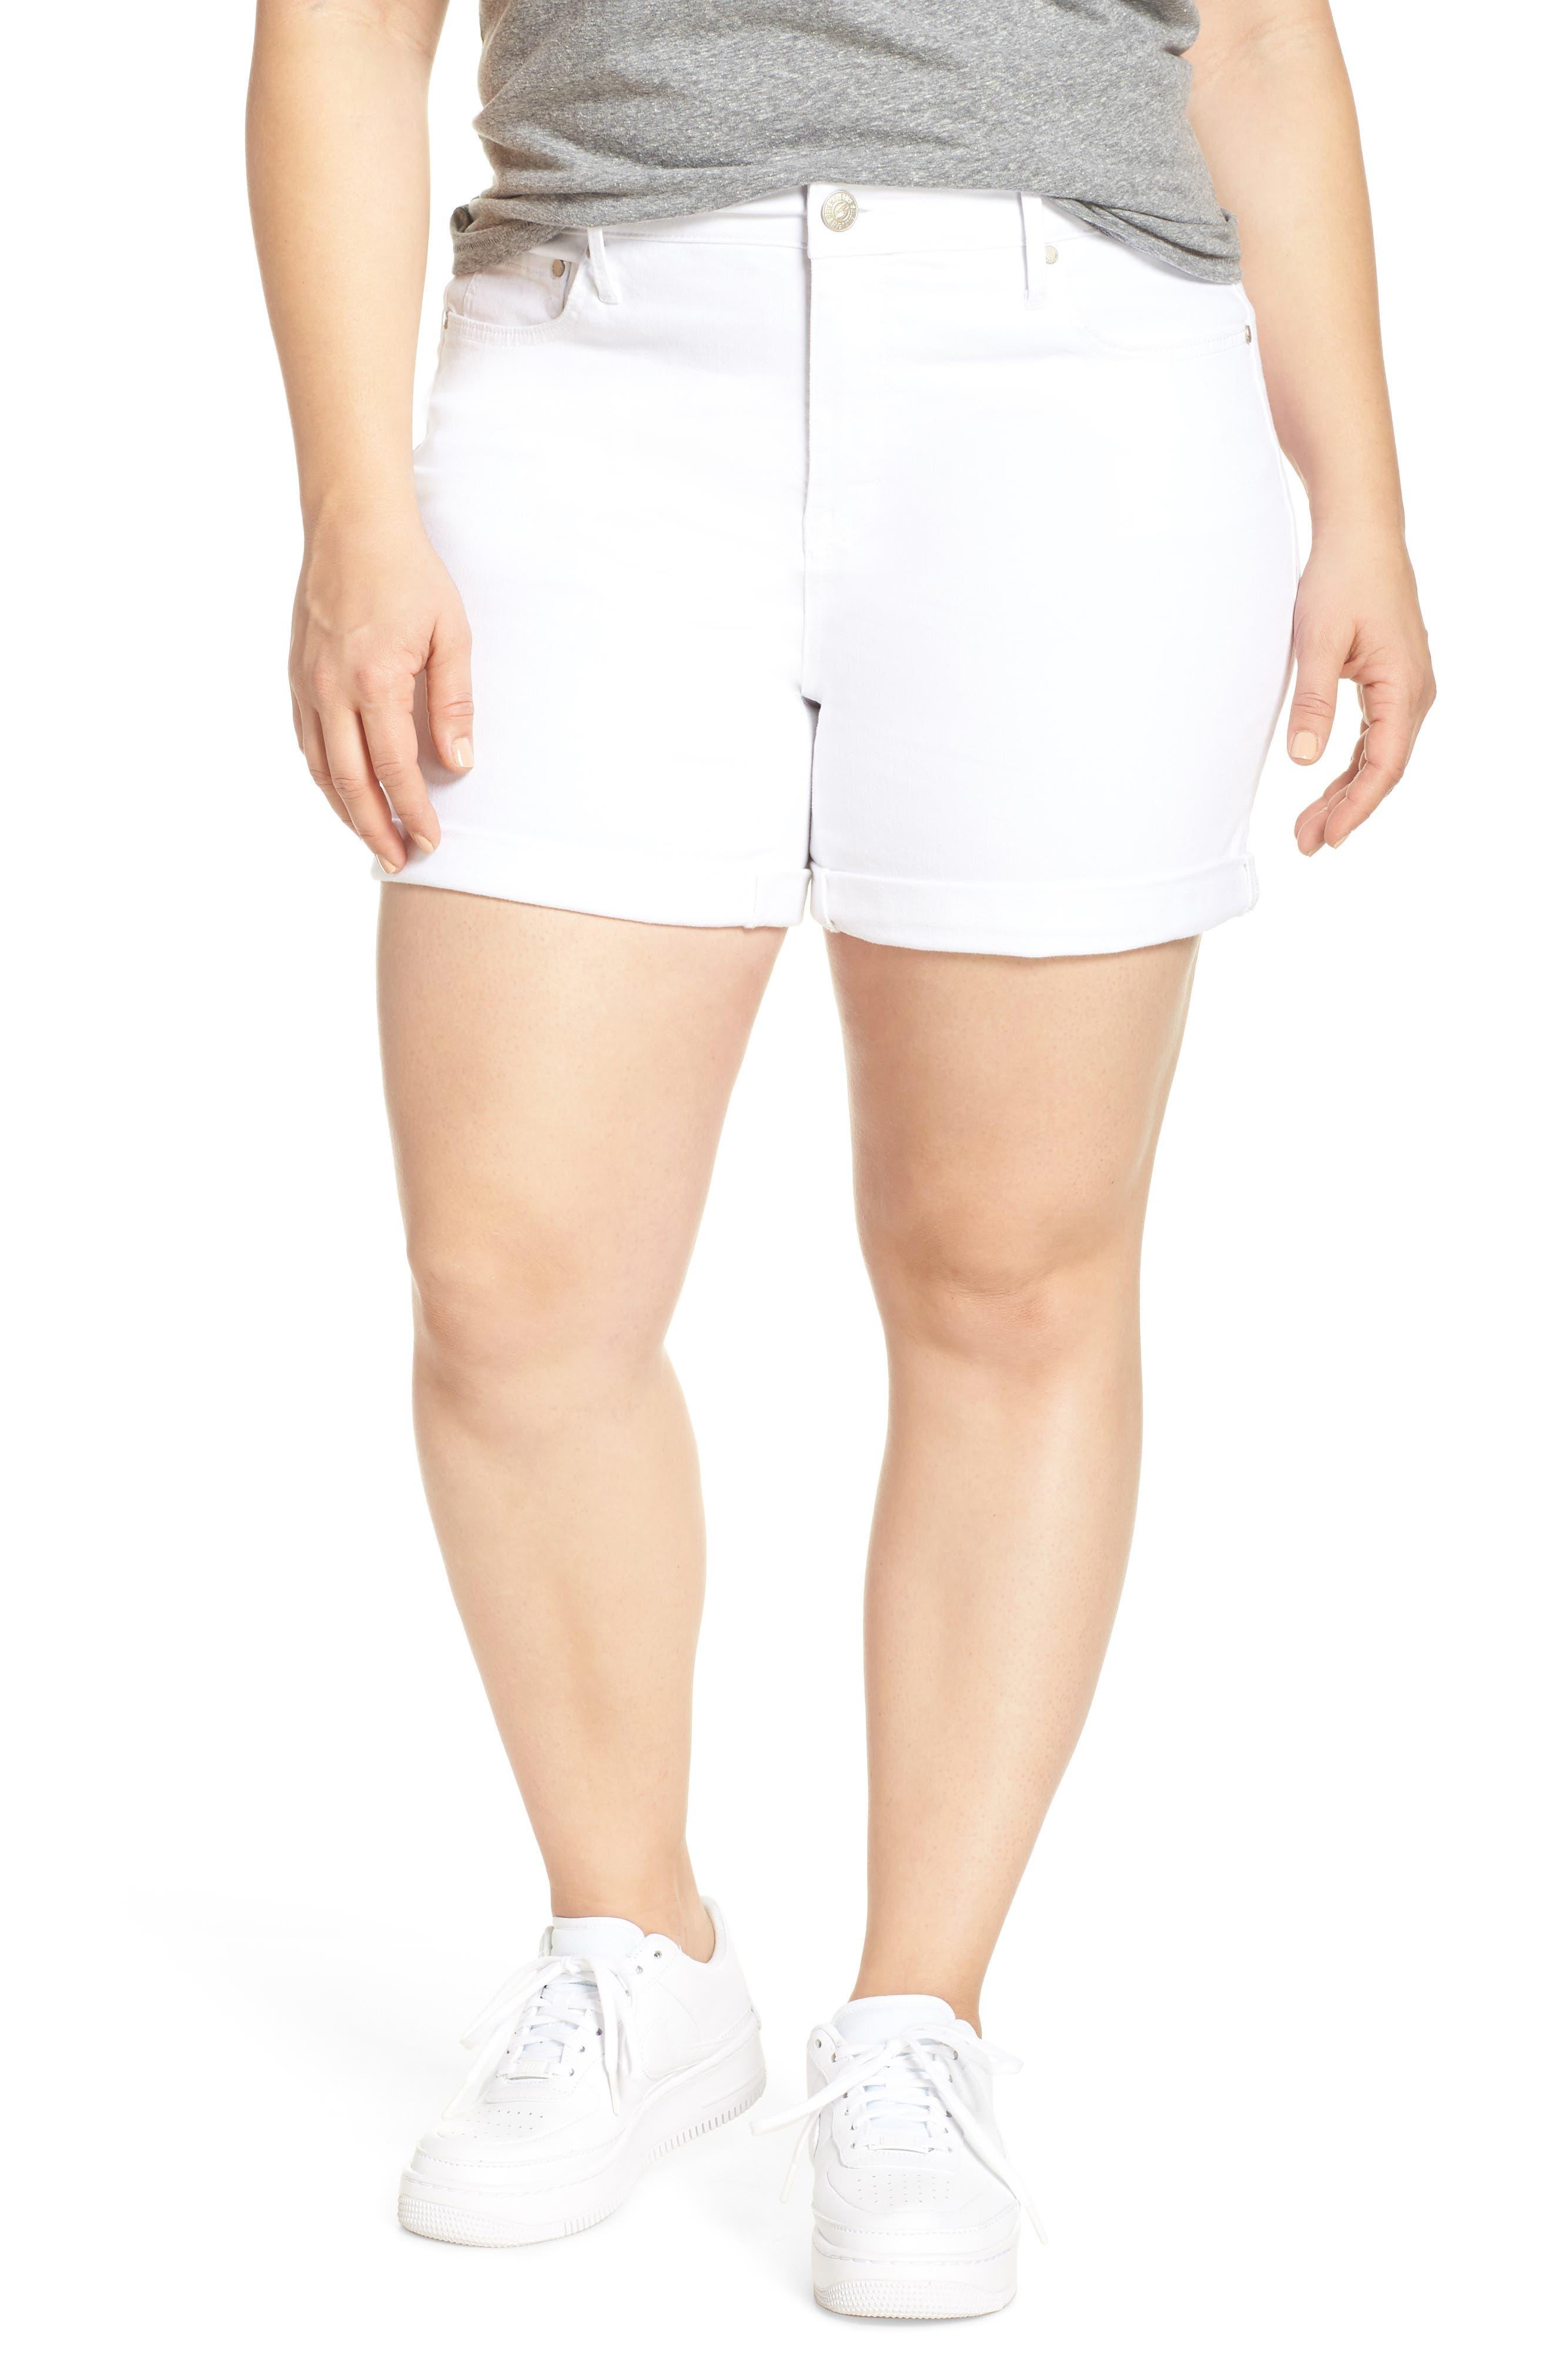 SEVEN7 High Waist Stretch Denim Shorts, Main, color, BLANC DE BLANC